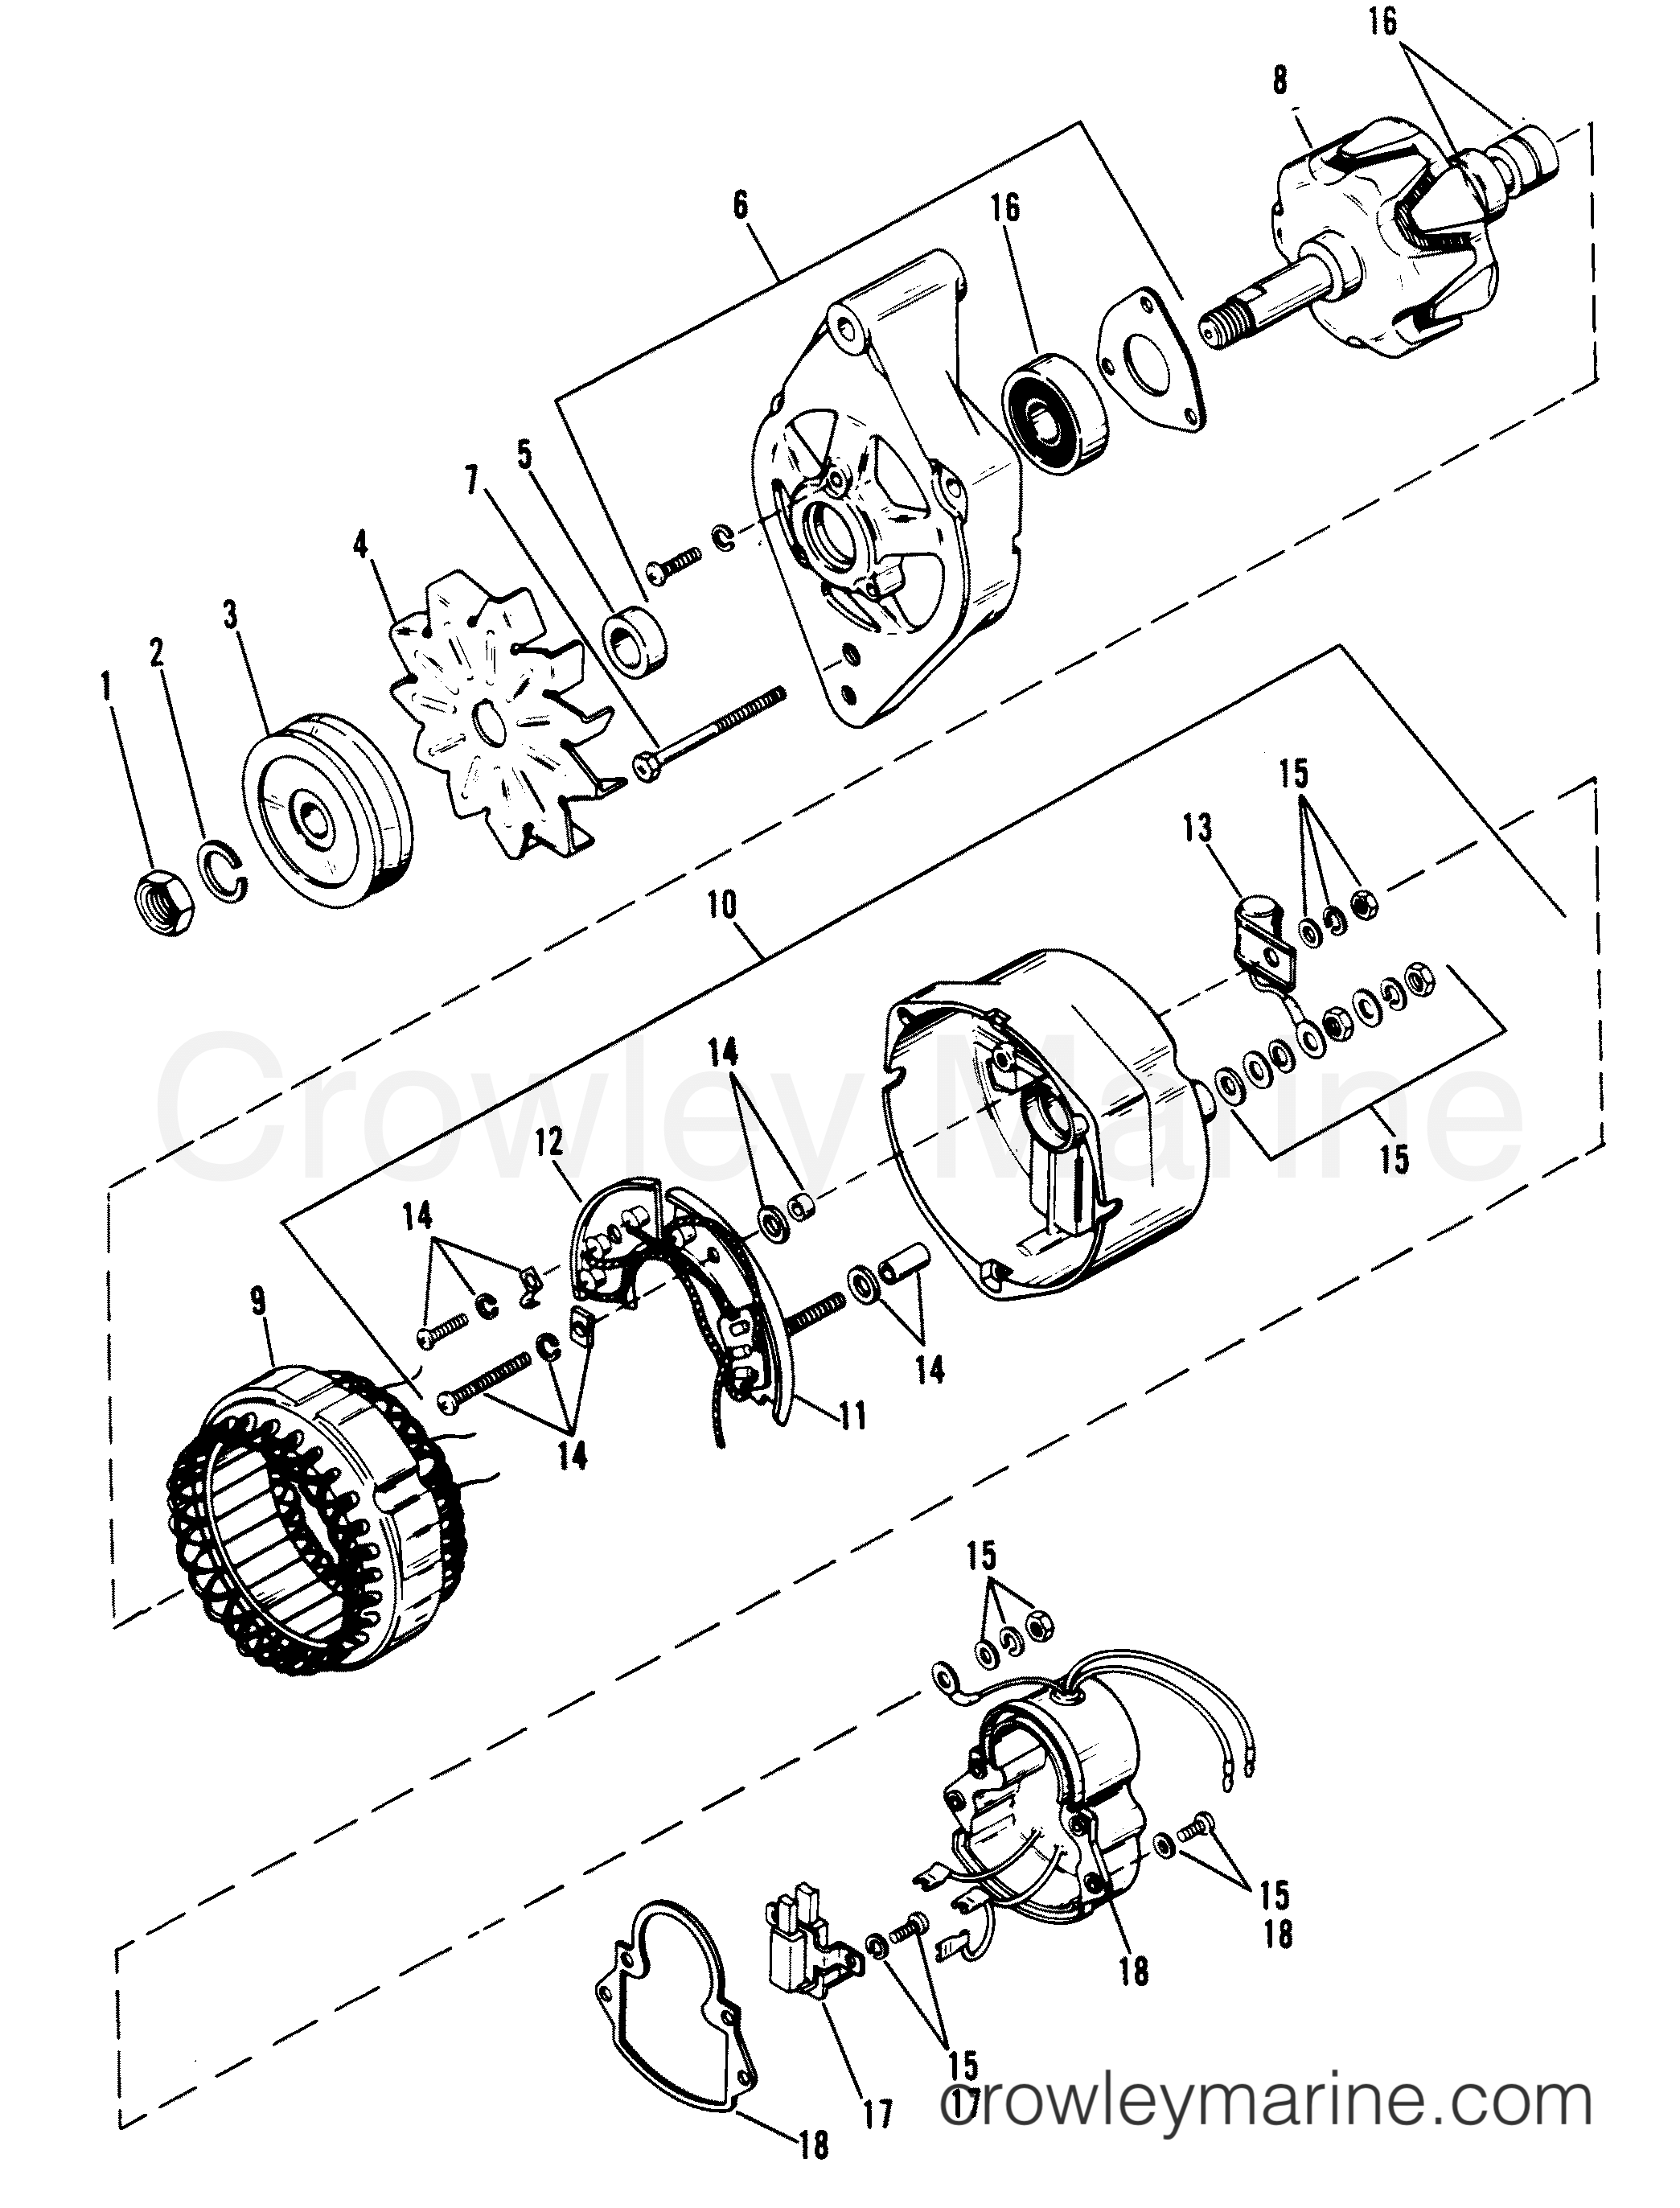 ALTERNATOR (MANDO) - 1986 Mercruiser 454 06661346 | Crowley Marine